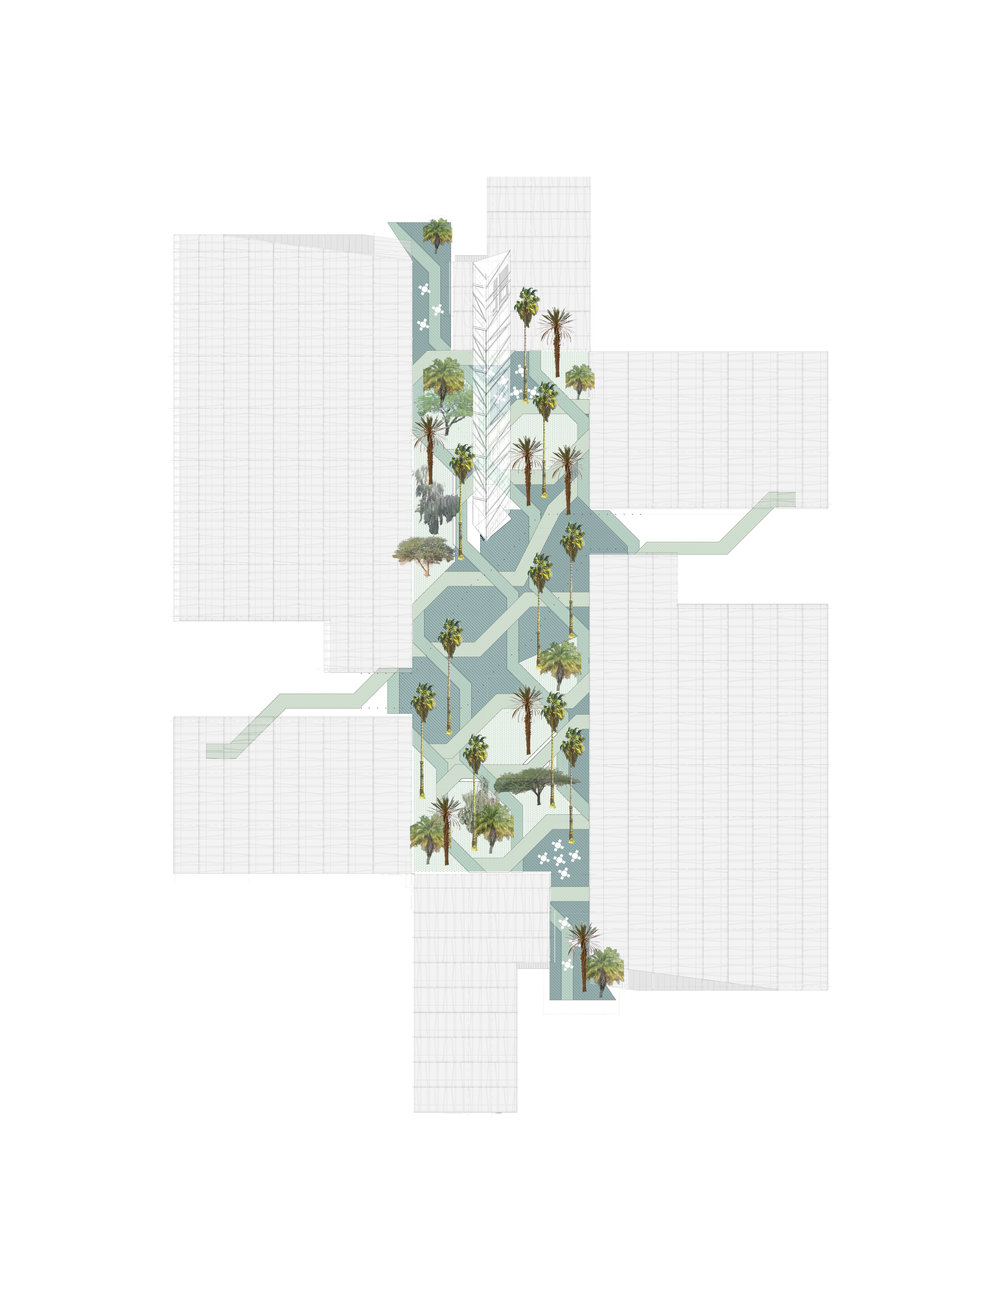 BA_Hermas_Courtyard Concept_1.jpg